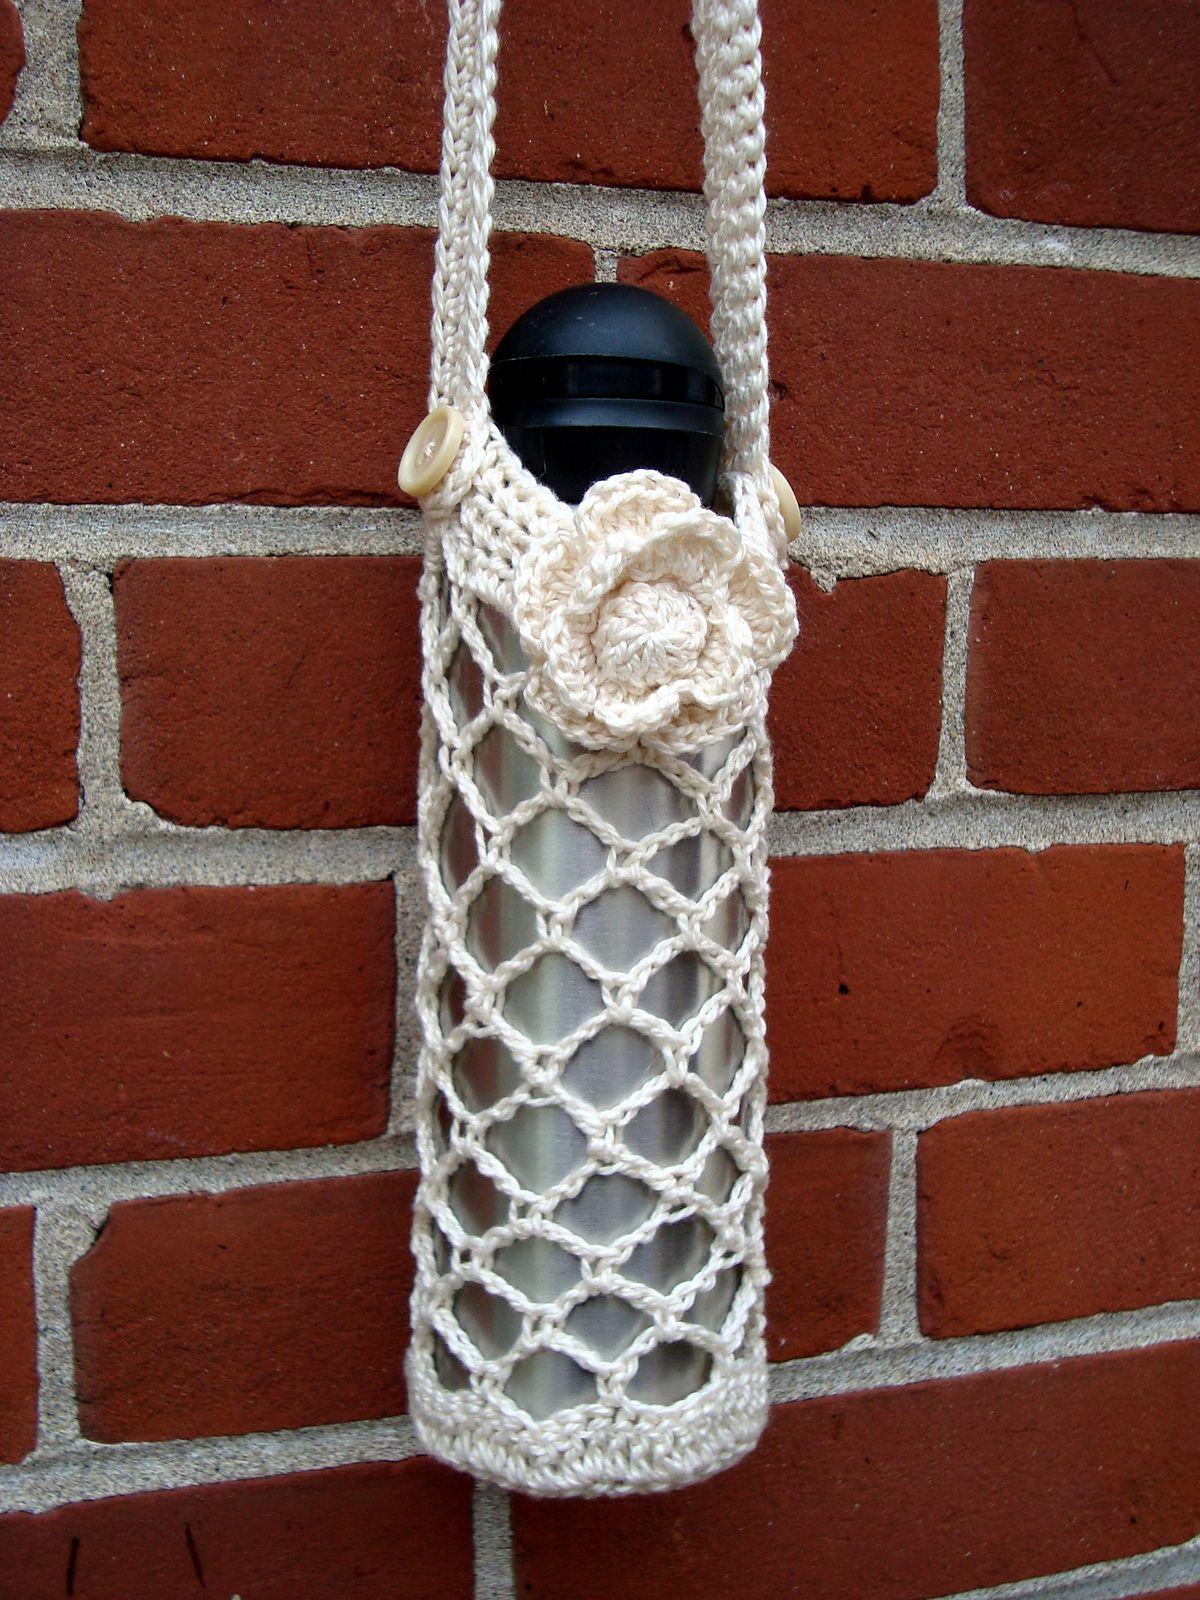 Ravelry diamond mesh water bottle holder by jennifer ozses ayse diamond mesh water bottle holder free pattern from right brain crochet by jennifer ozses bankloansurffo Choice Image